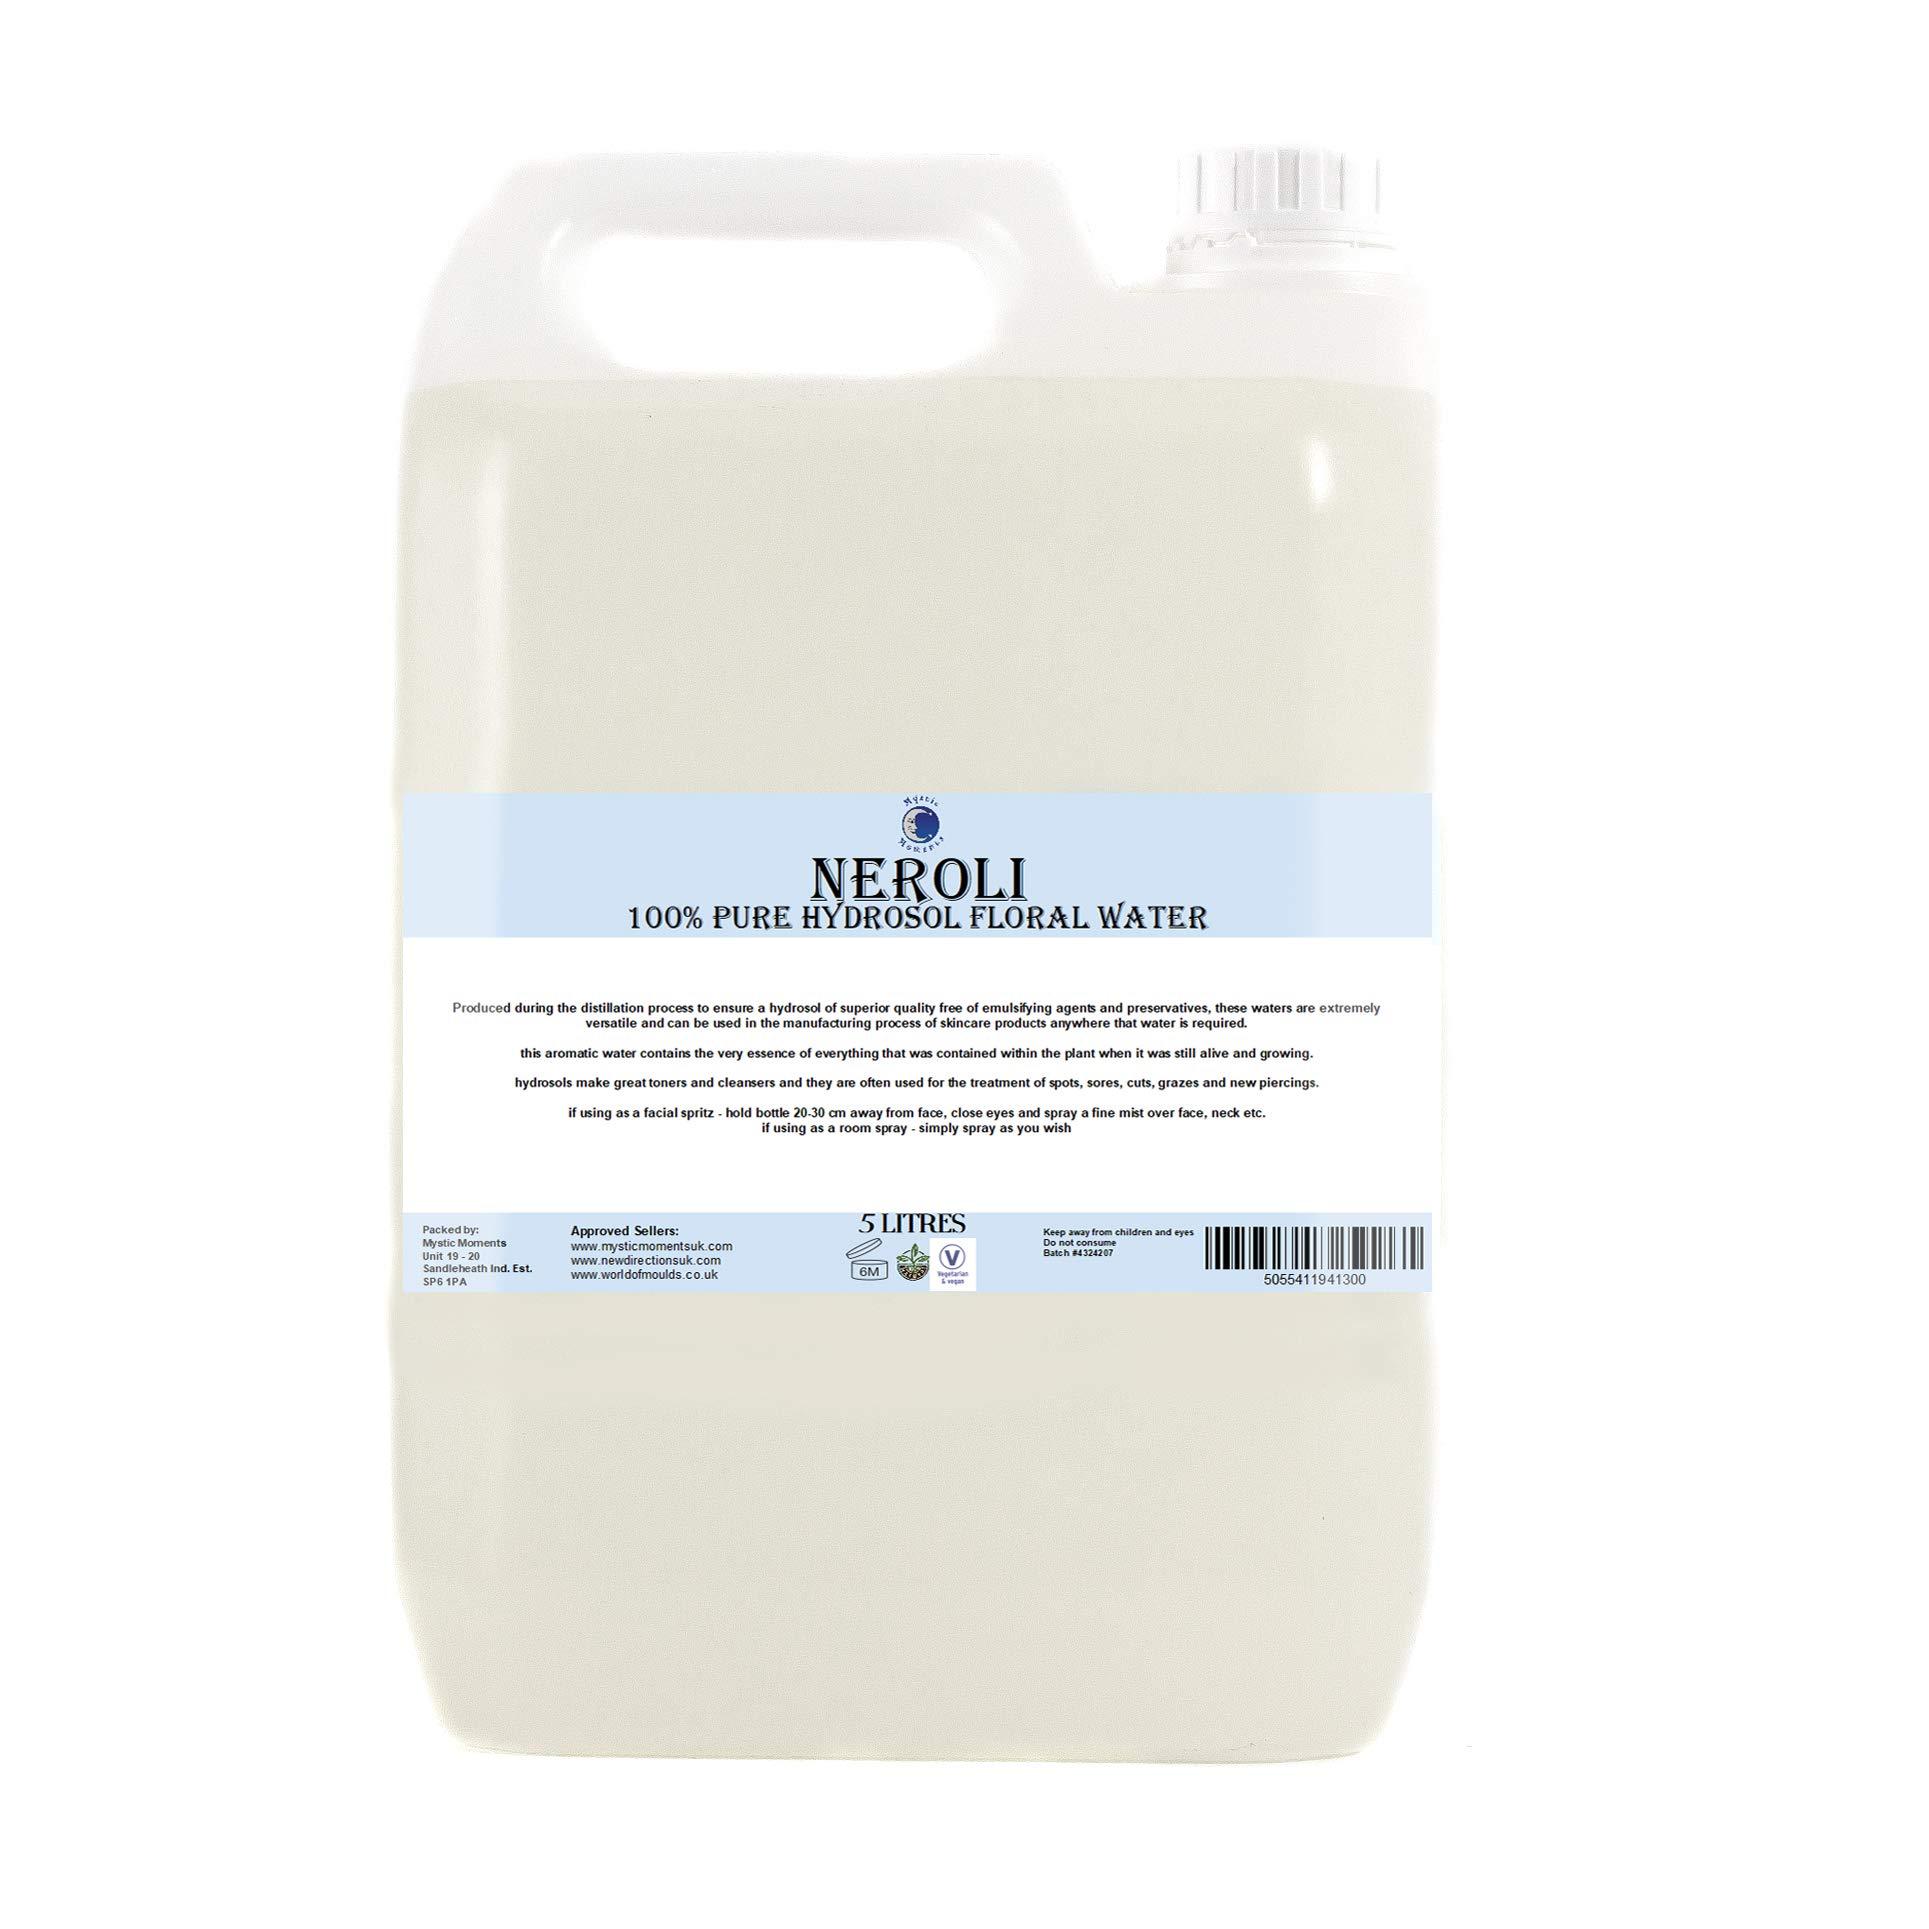 Neroli Hydrosol Floral Water - 5 litres